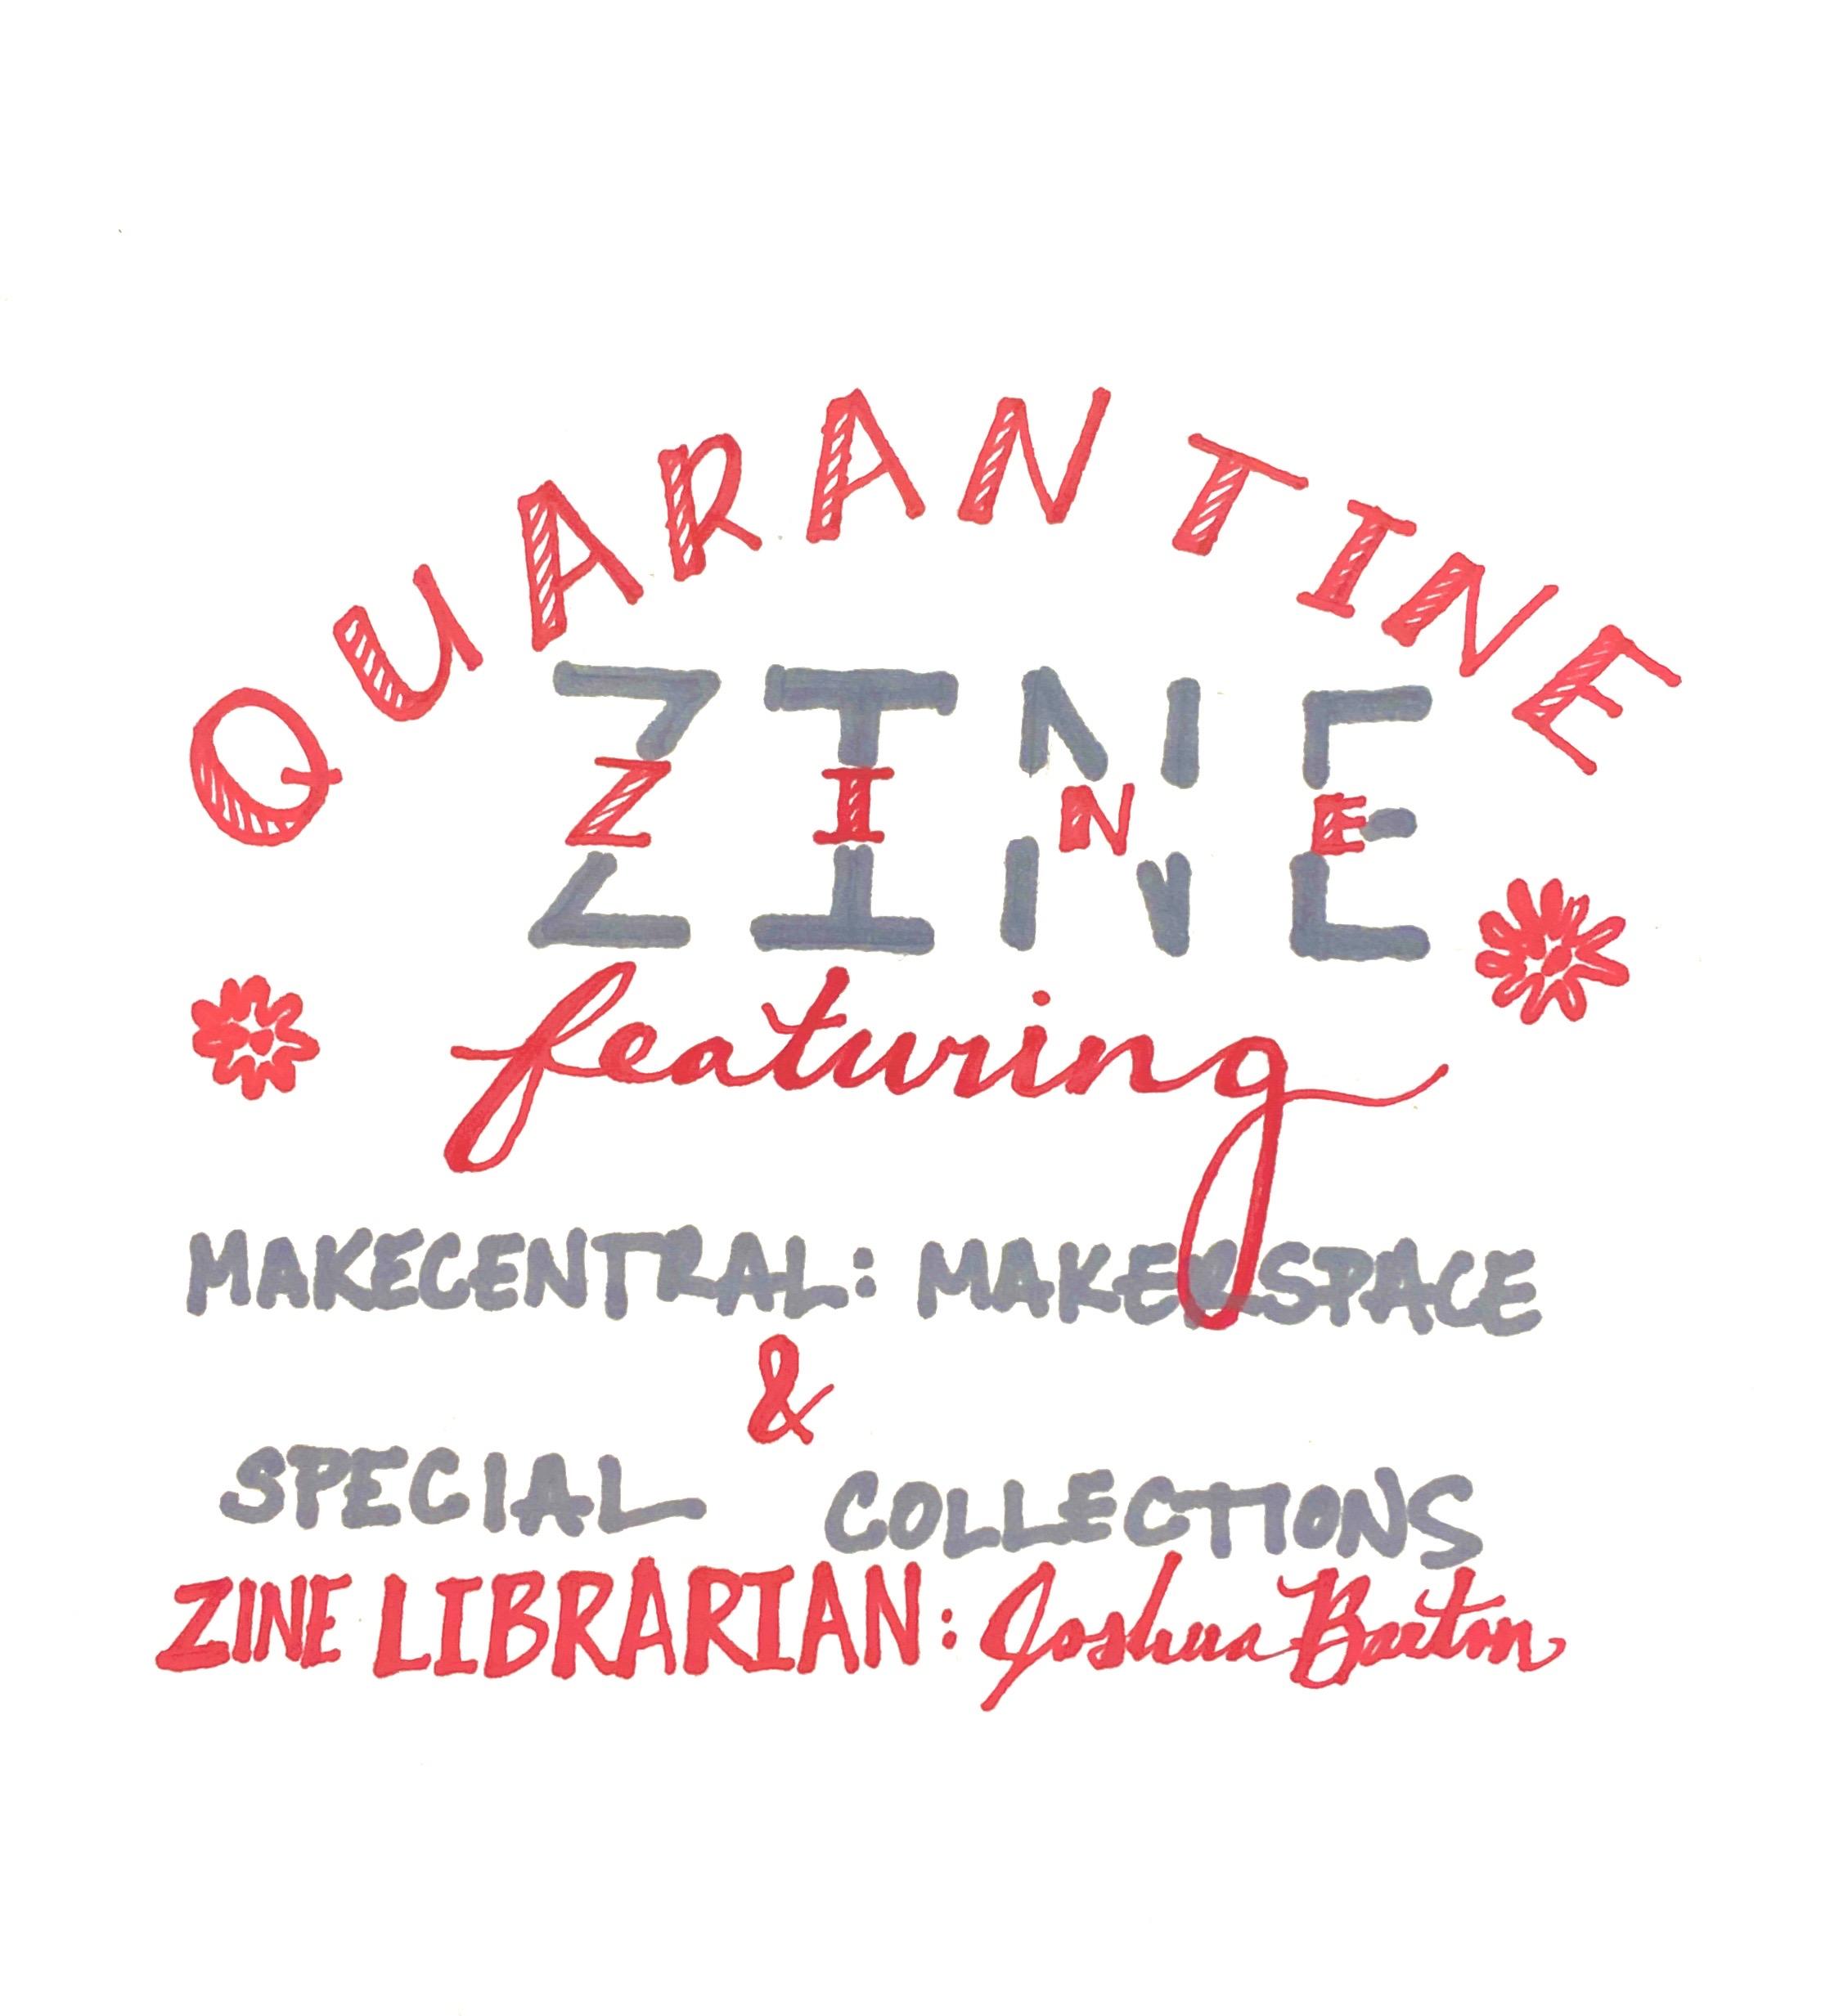 Quarantine Zine Maker Meetup